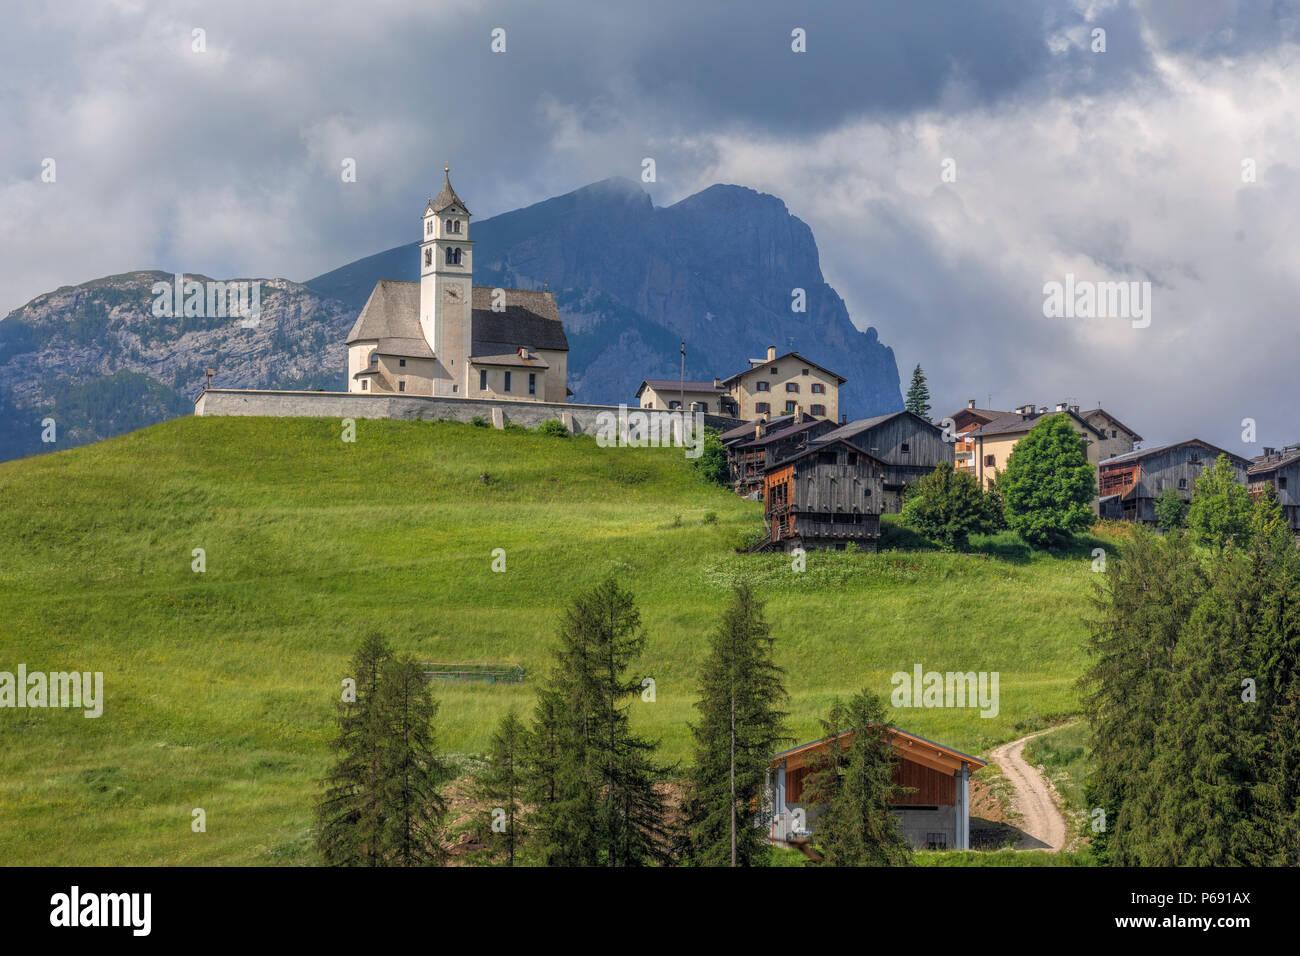 Colle Santa Lucia, Belluno, Veneto, Dolomites, Italy, Europe - Stock Image